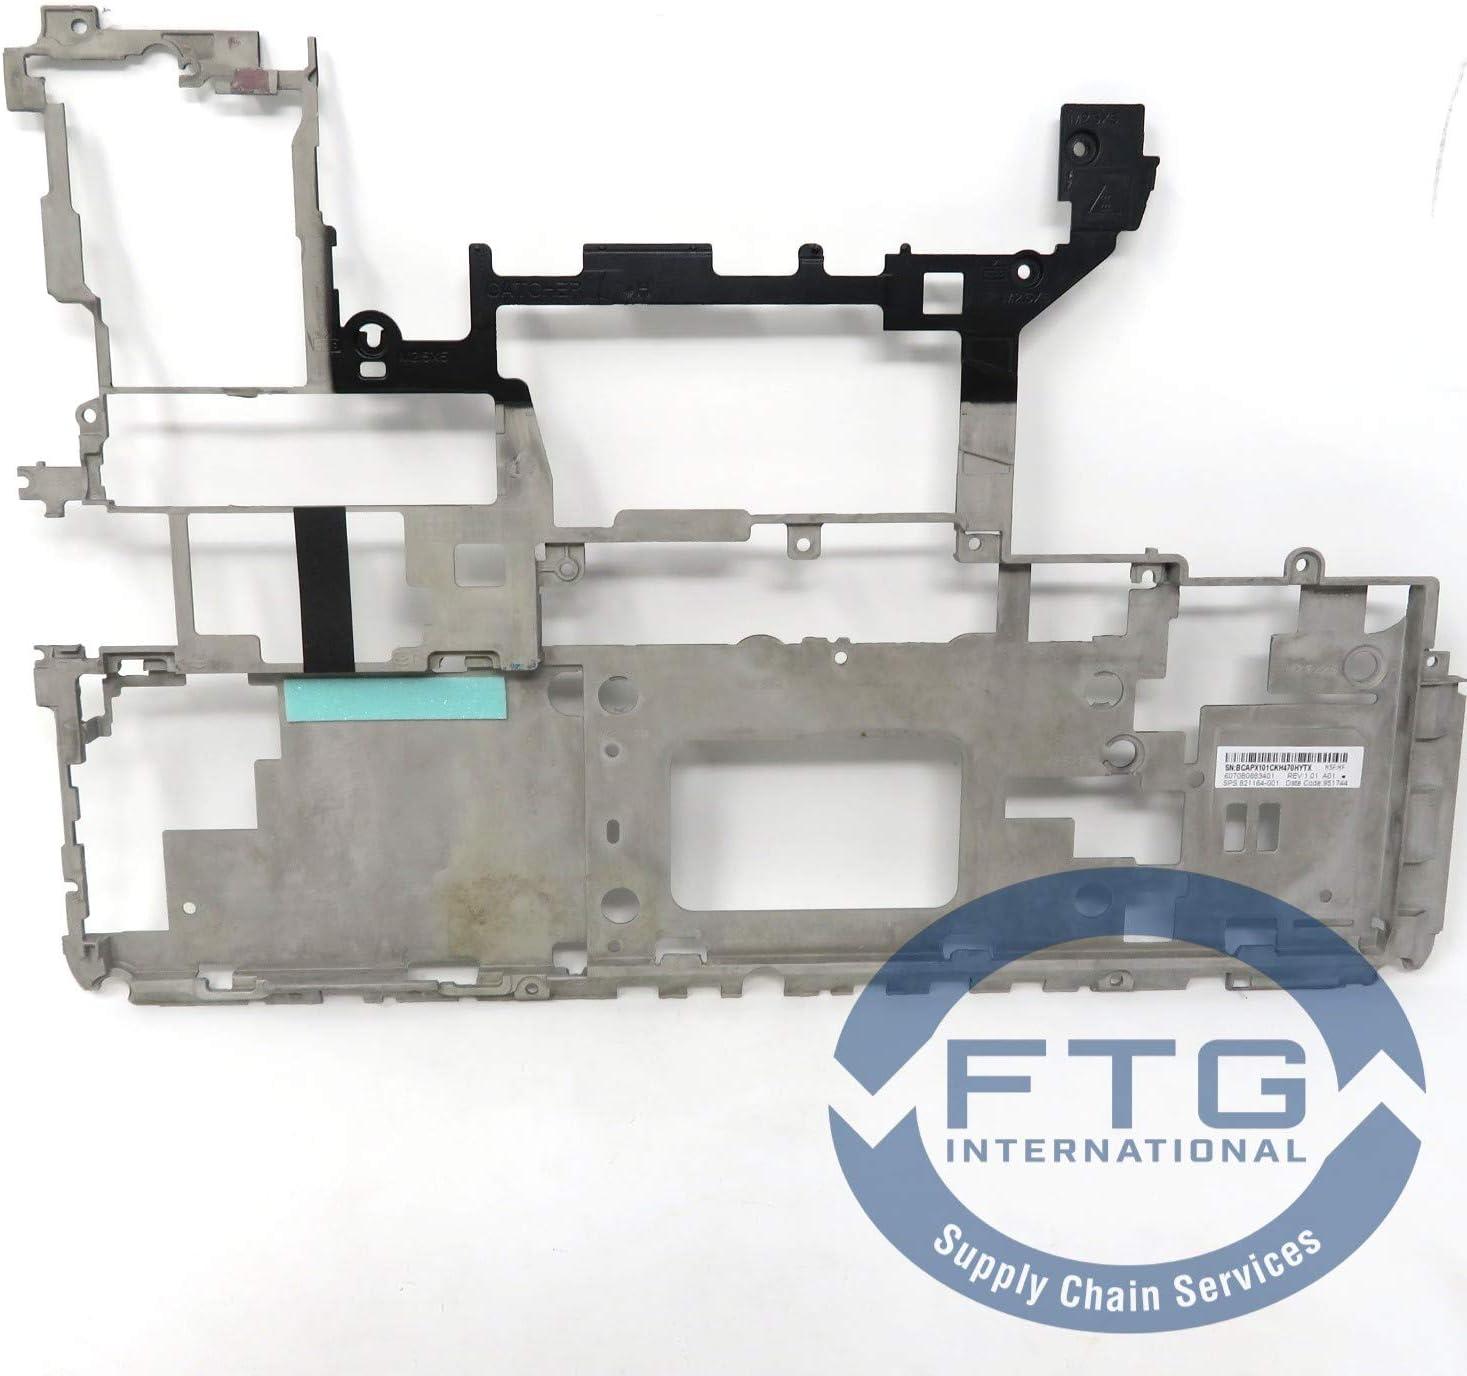 821164-001 SPS-Base Plate Internal 14